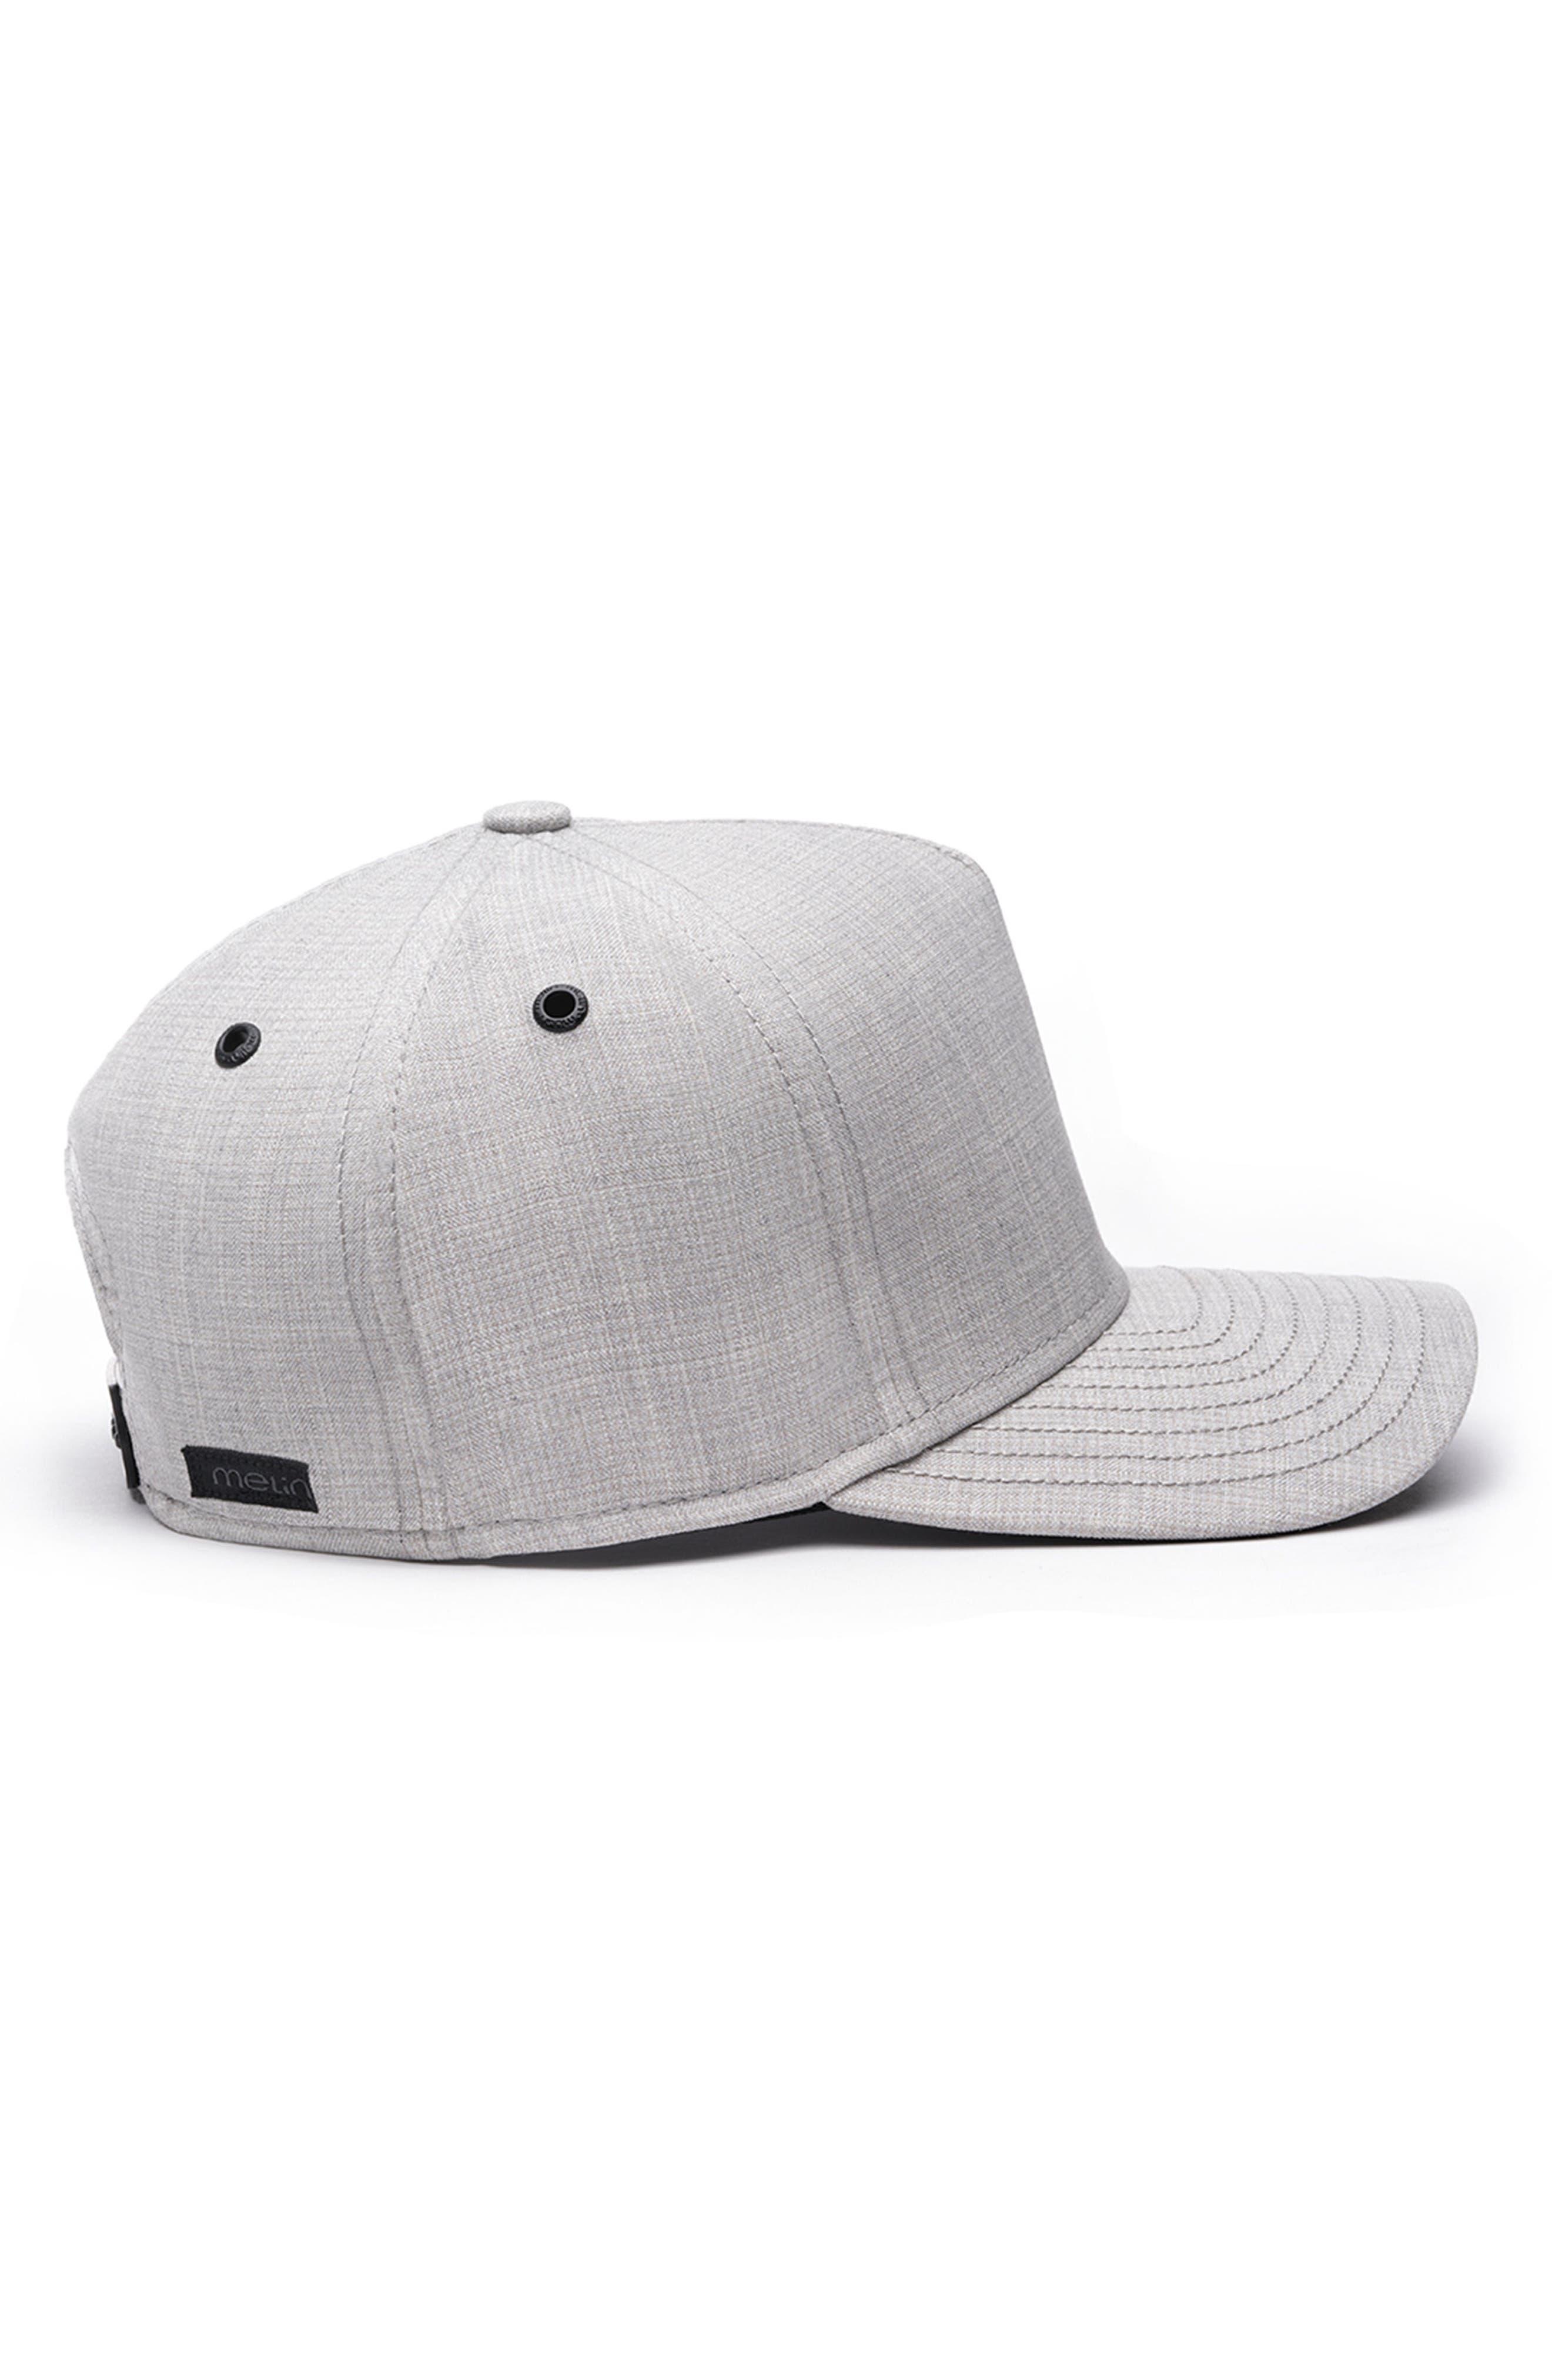 Odyssey Baseball Cap,                             Alternate thumbnail 4, color,                             Light Grey